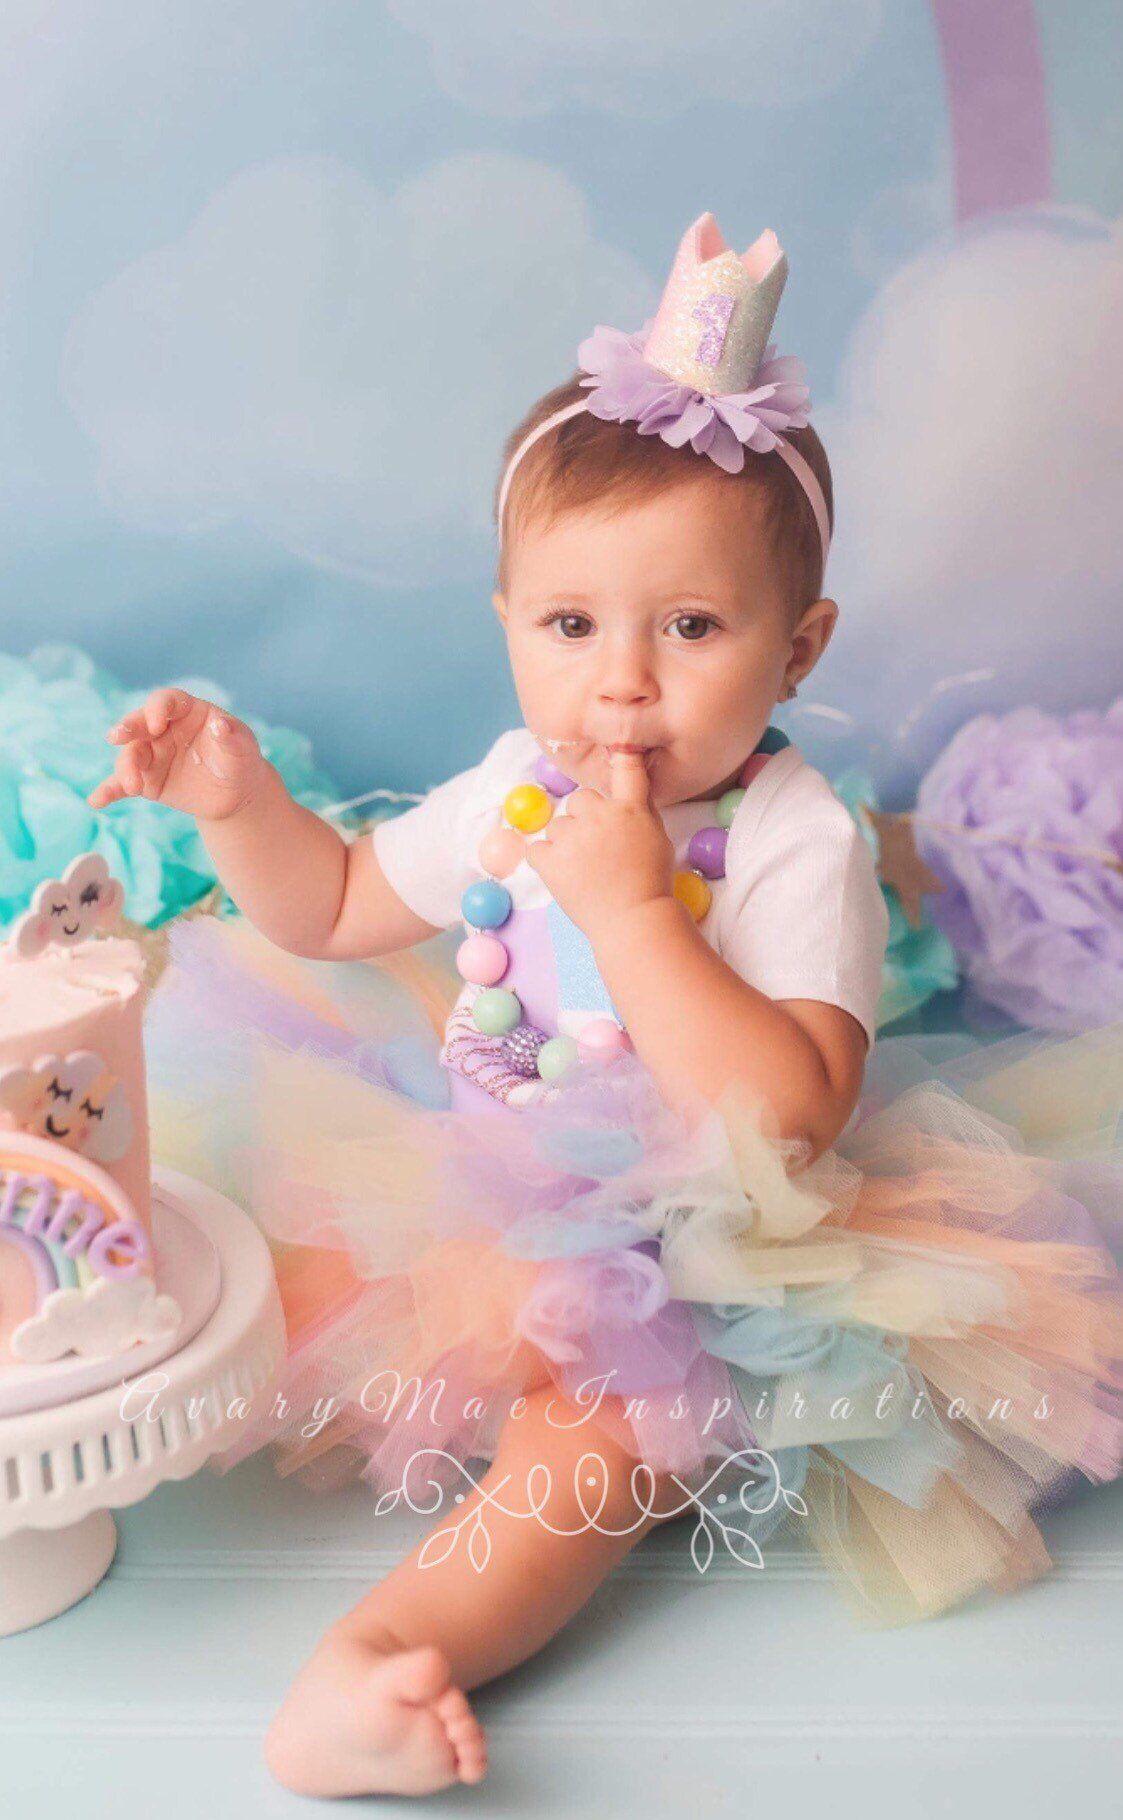 Pastel Rainbow Tutu, Baby Tutu, Infant Tutu, Toddler Tutu